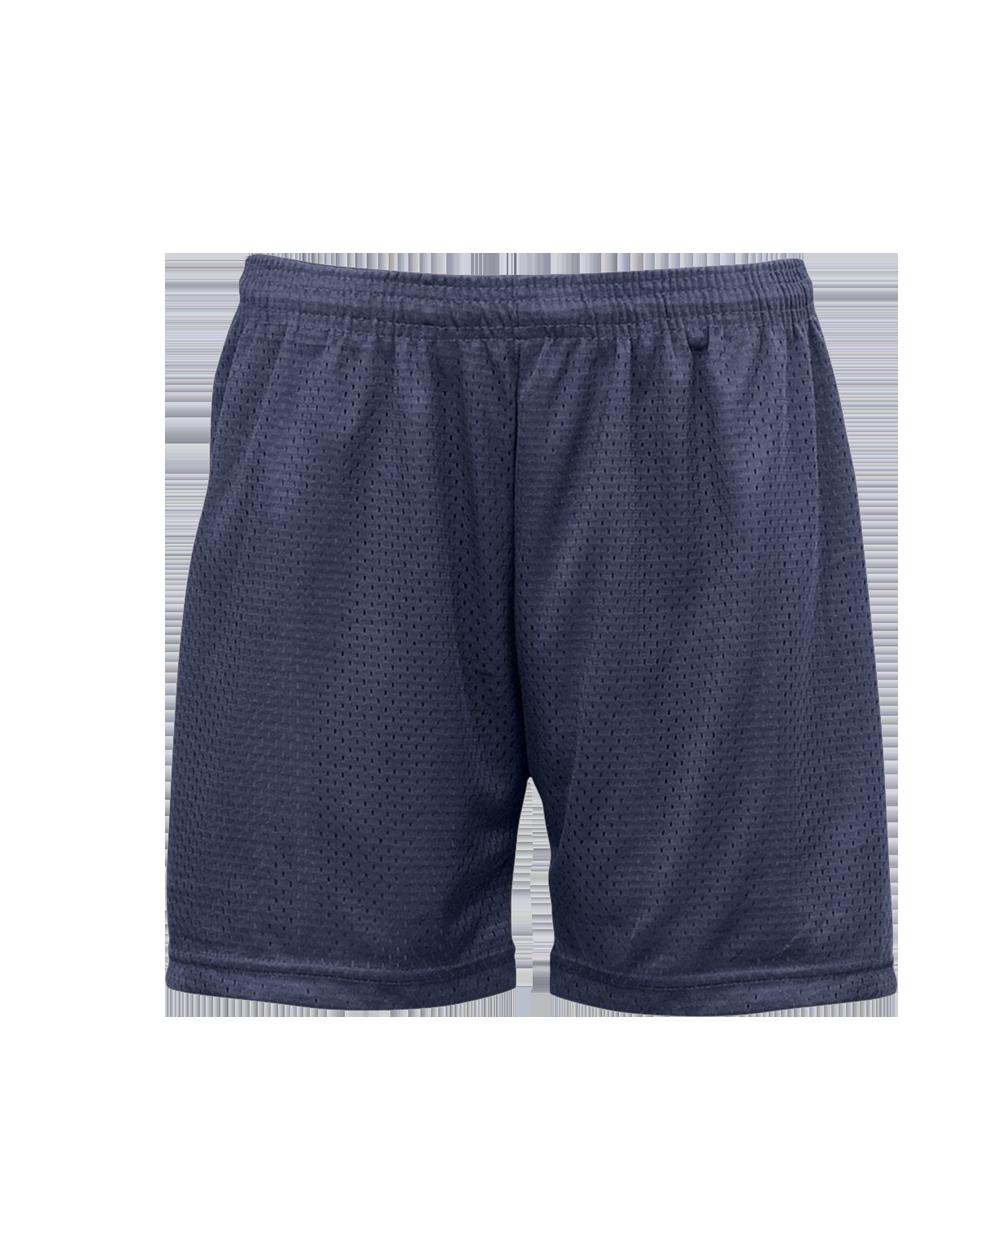 Mesh/Tricot Women's Short - Navy